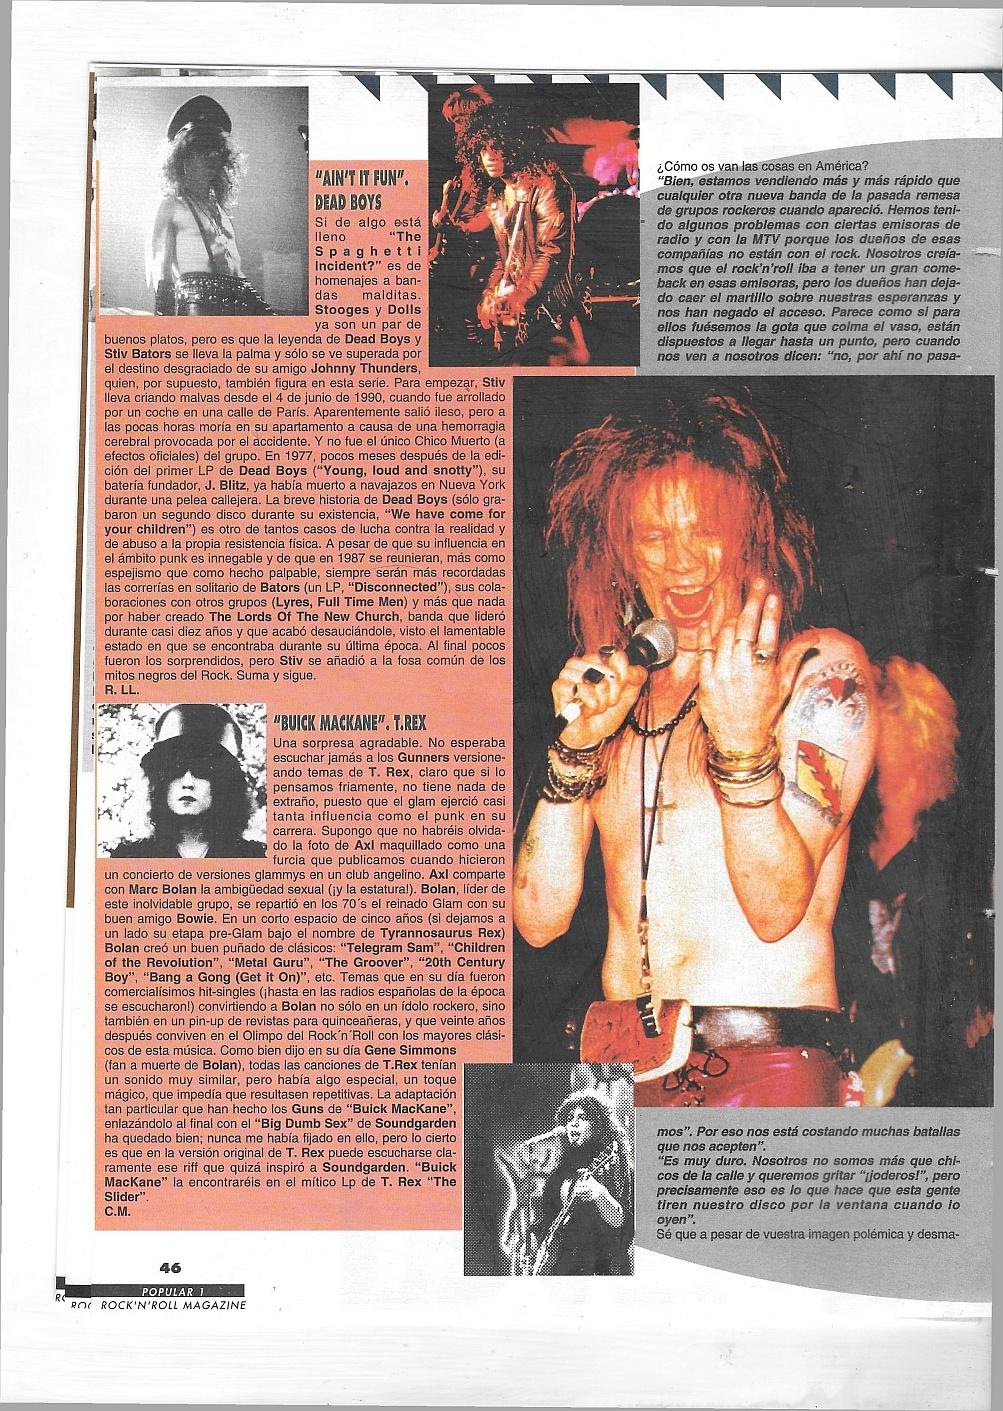 1988.04.DD - Popular 1 - Interview with Axl 1993_129